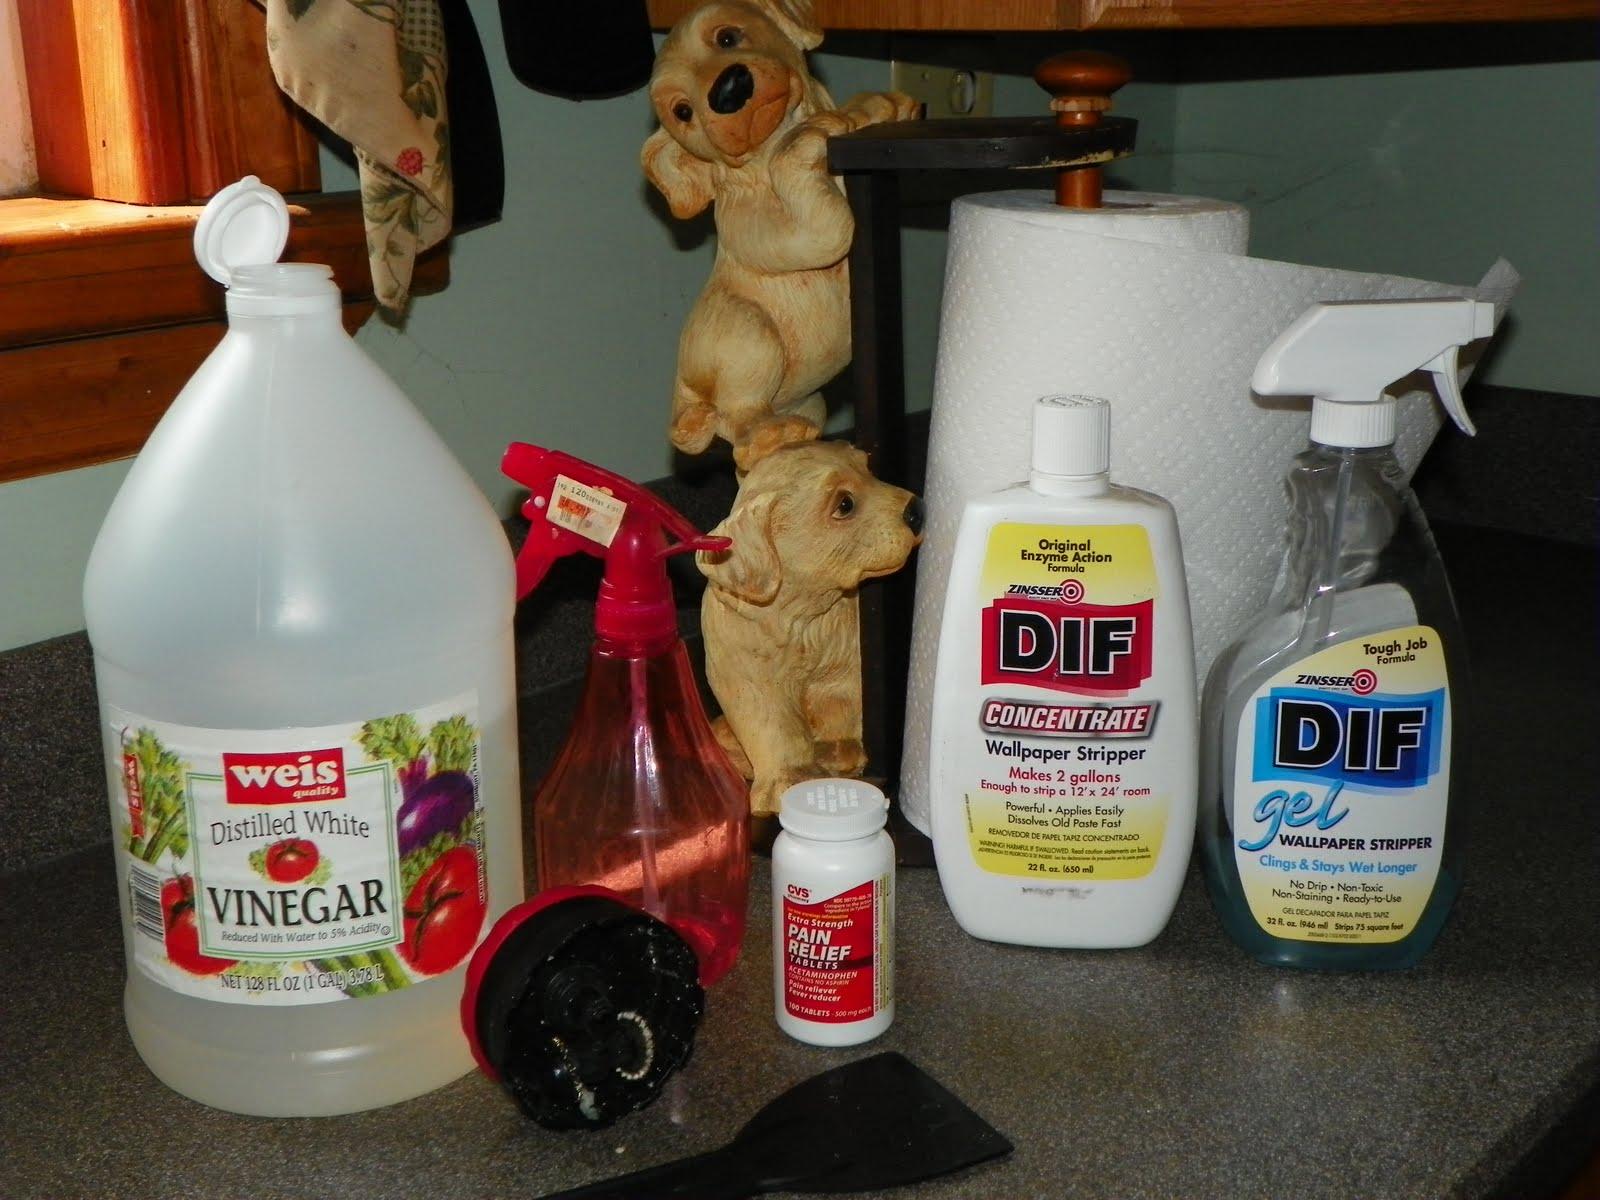 tools dif wallpaper remover wallpaper removal tools home depot fastest 1600x1200